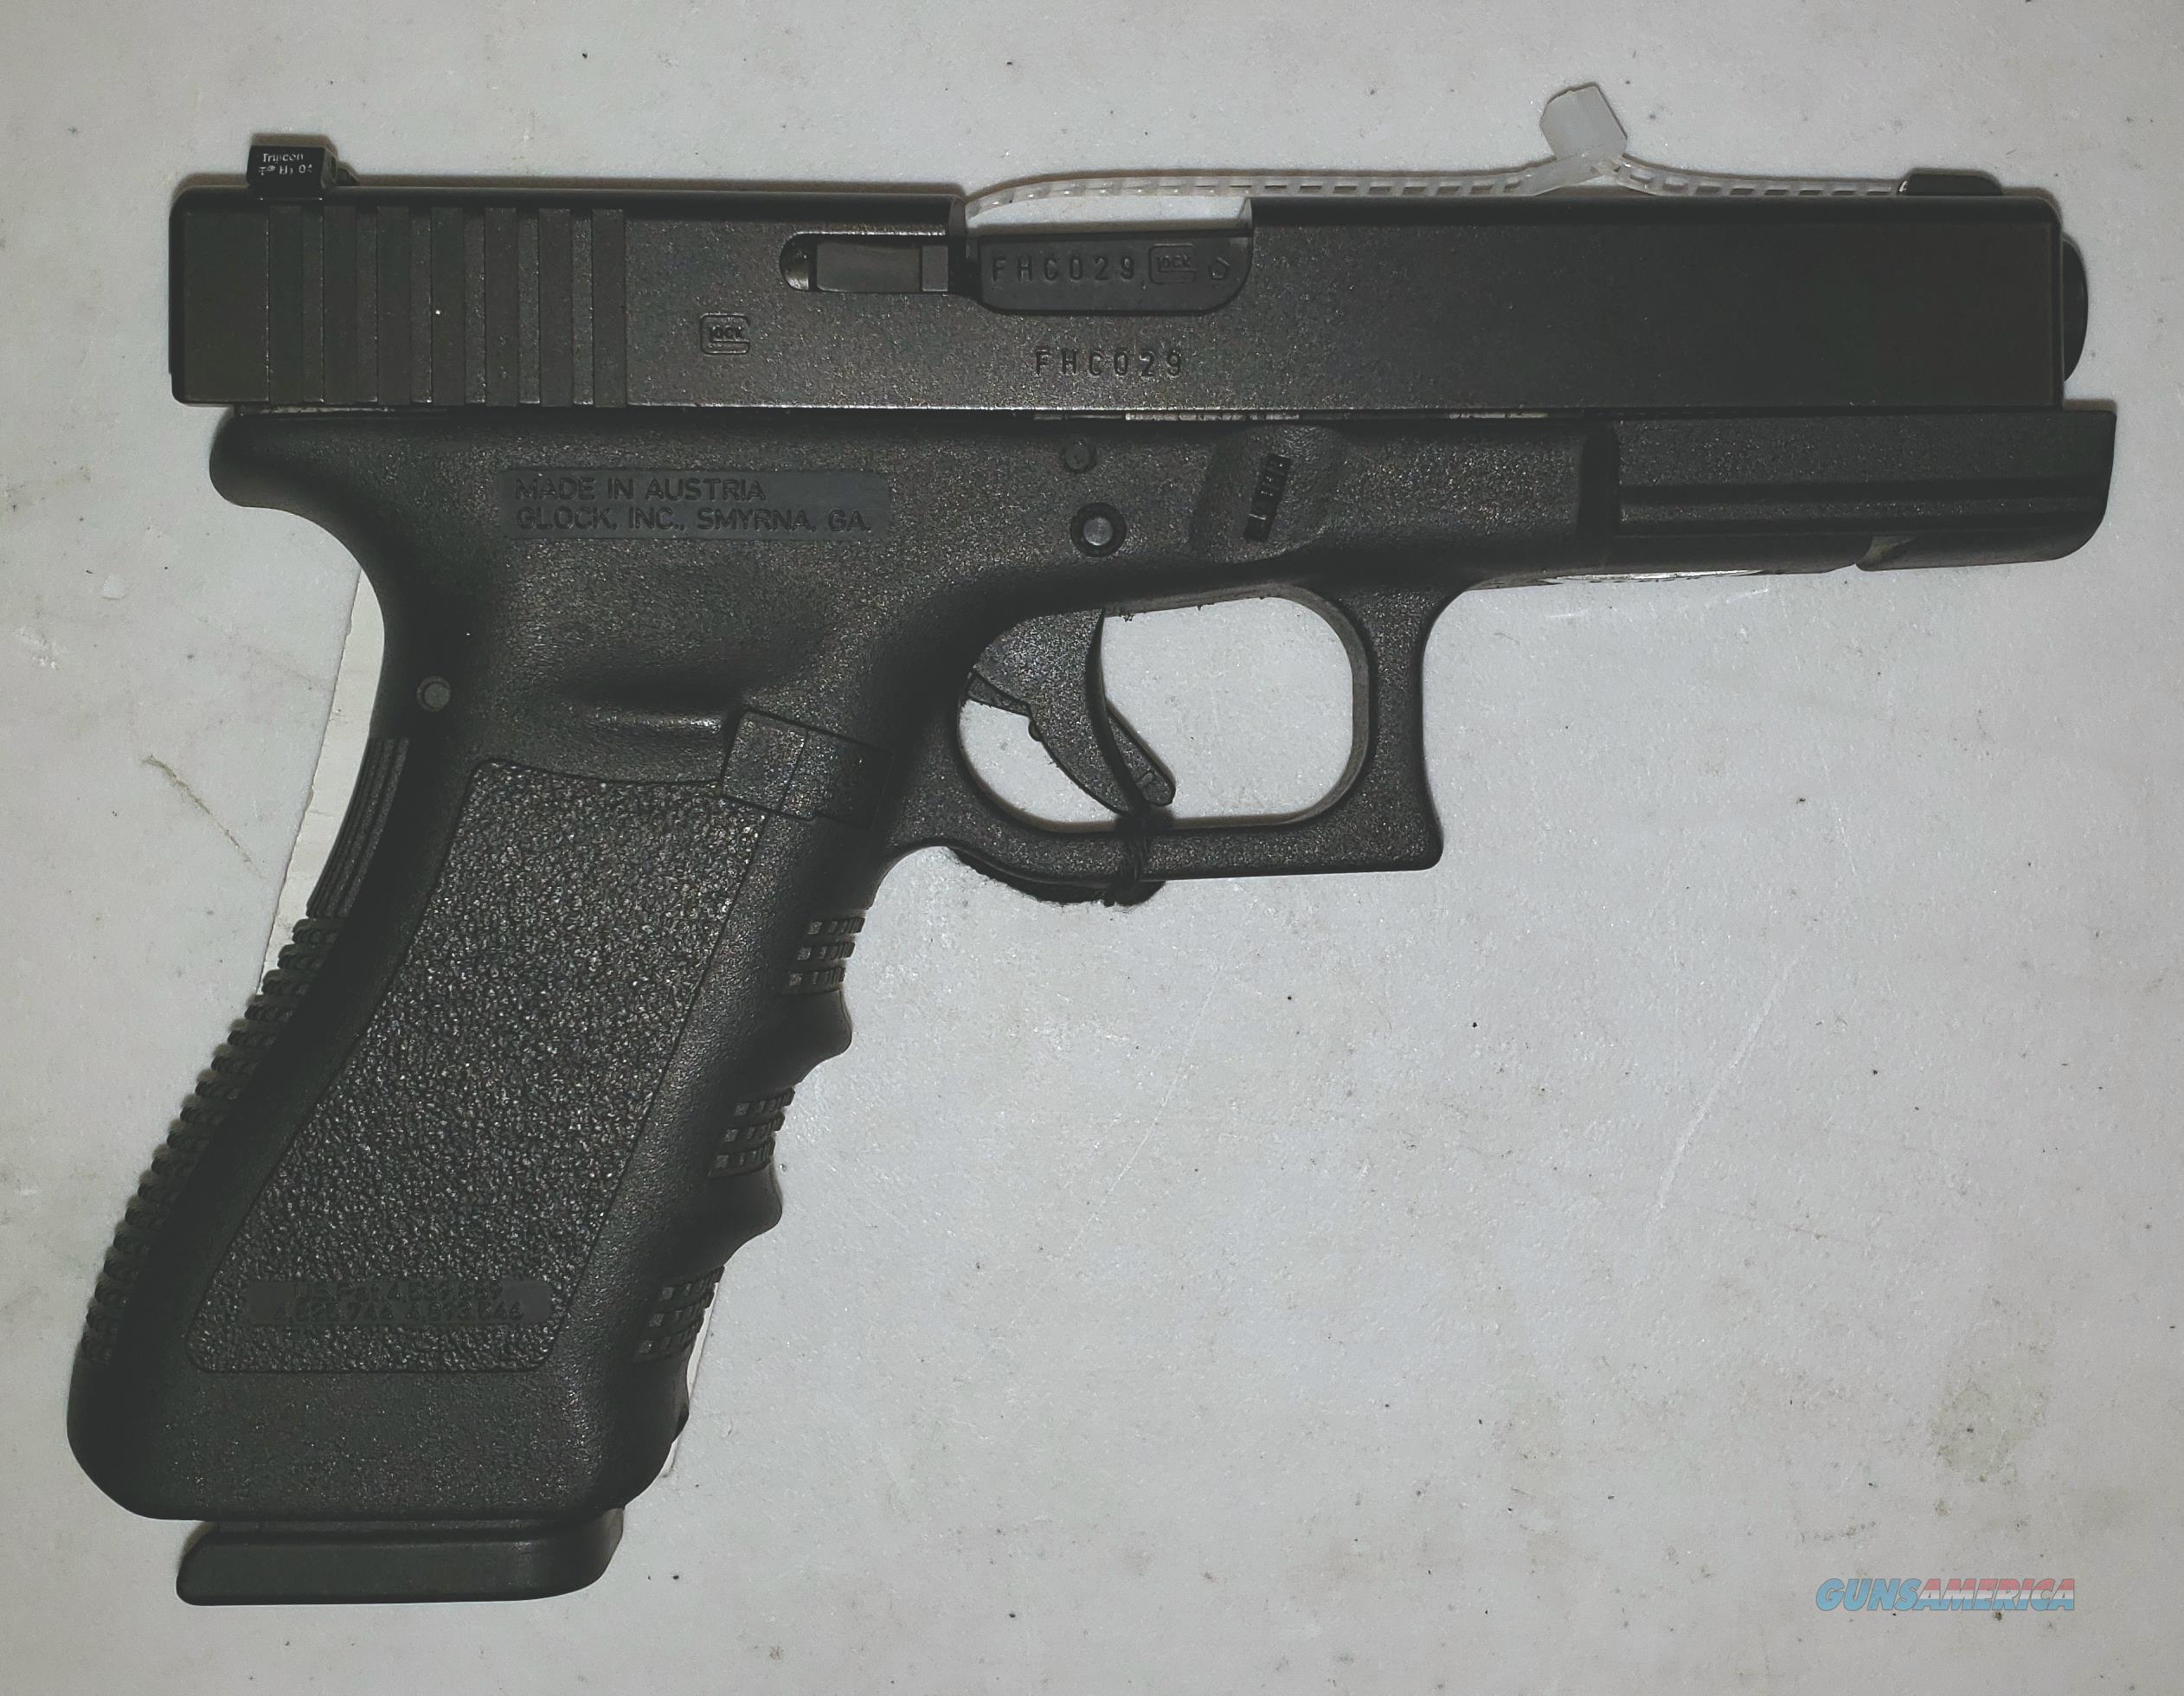 Glock 22 w/Night Sights  Guns > Pistols > Glock Pistols > 22